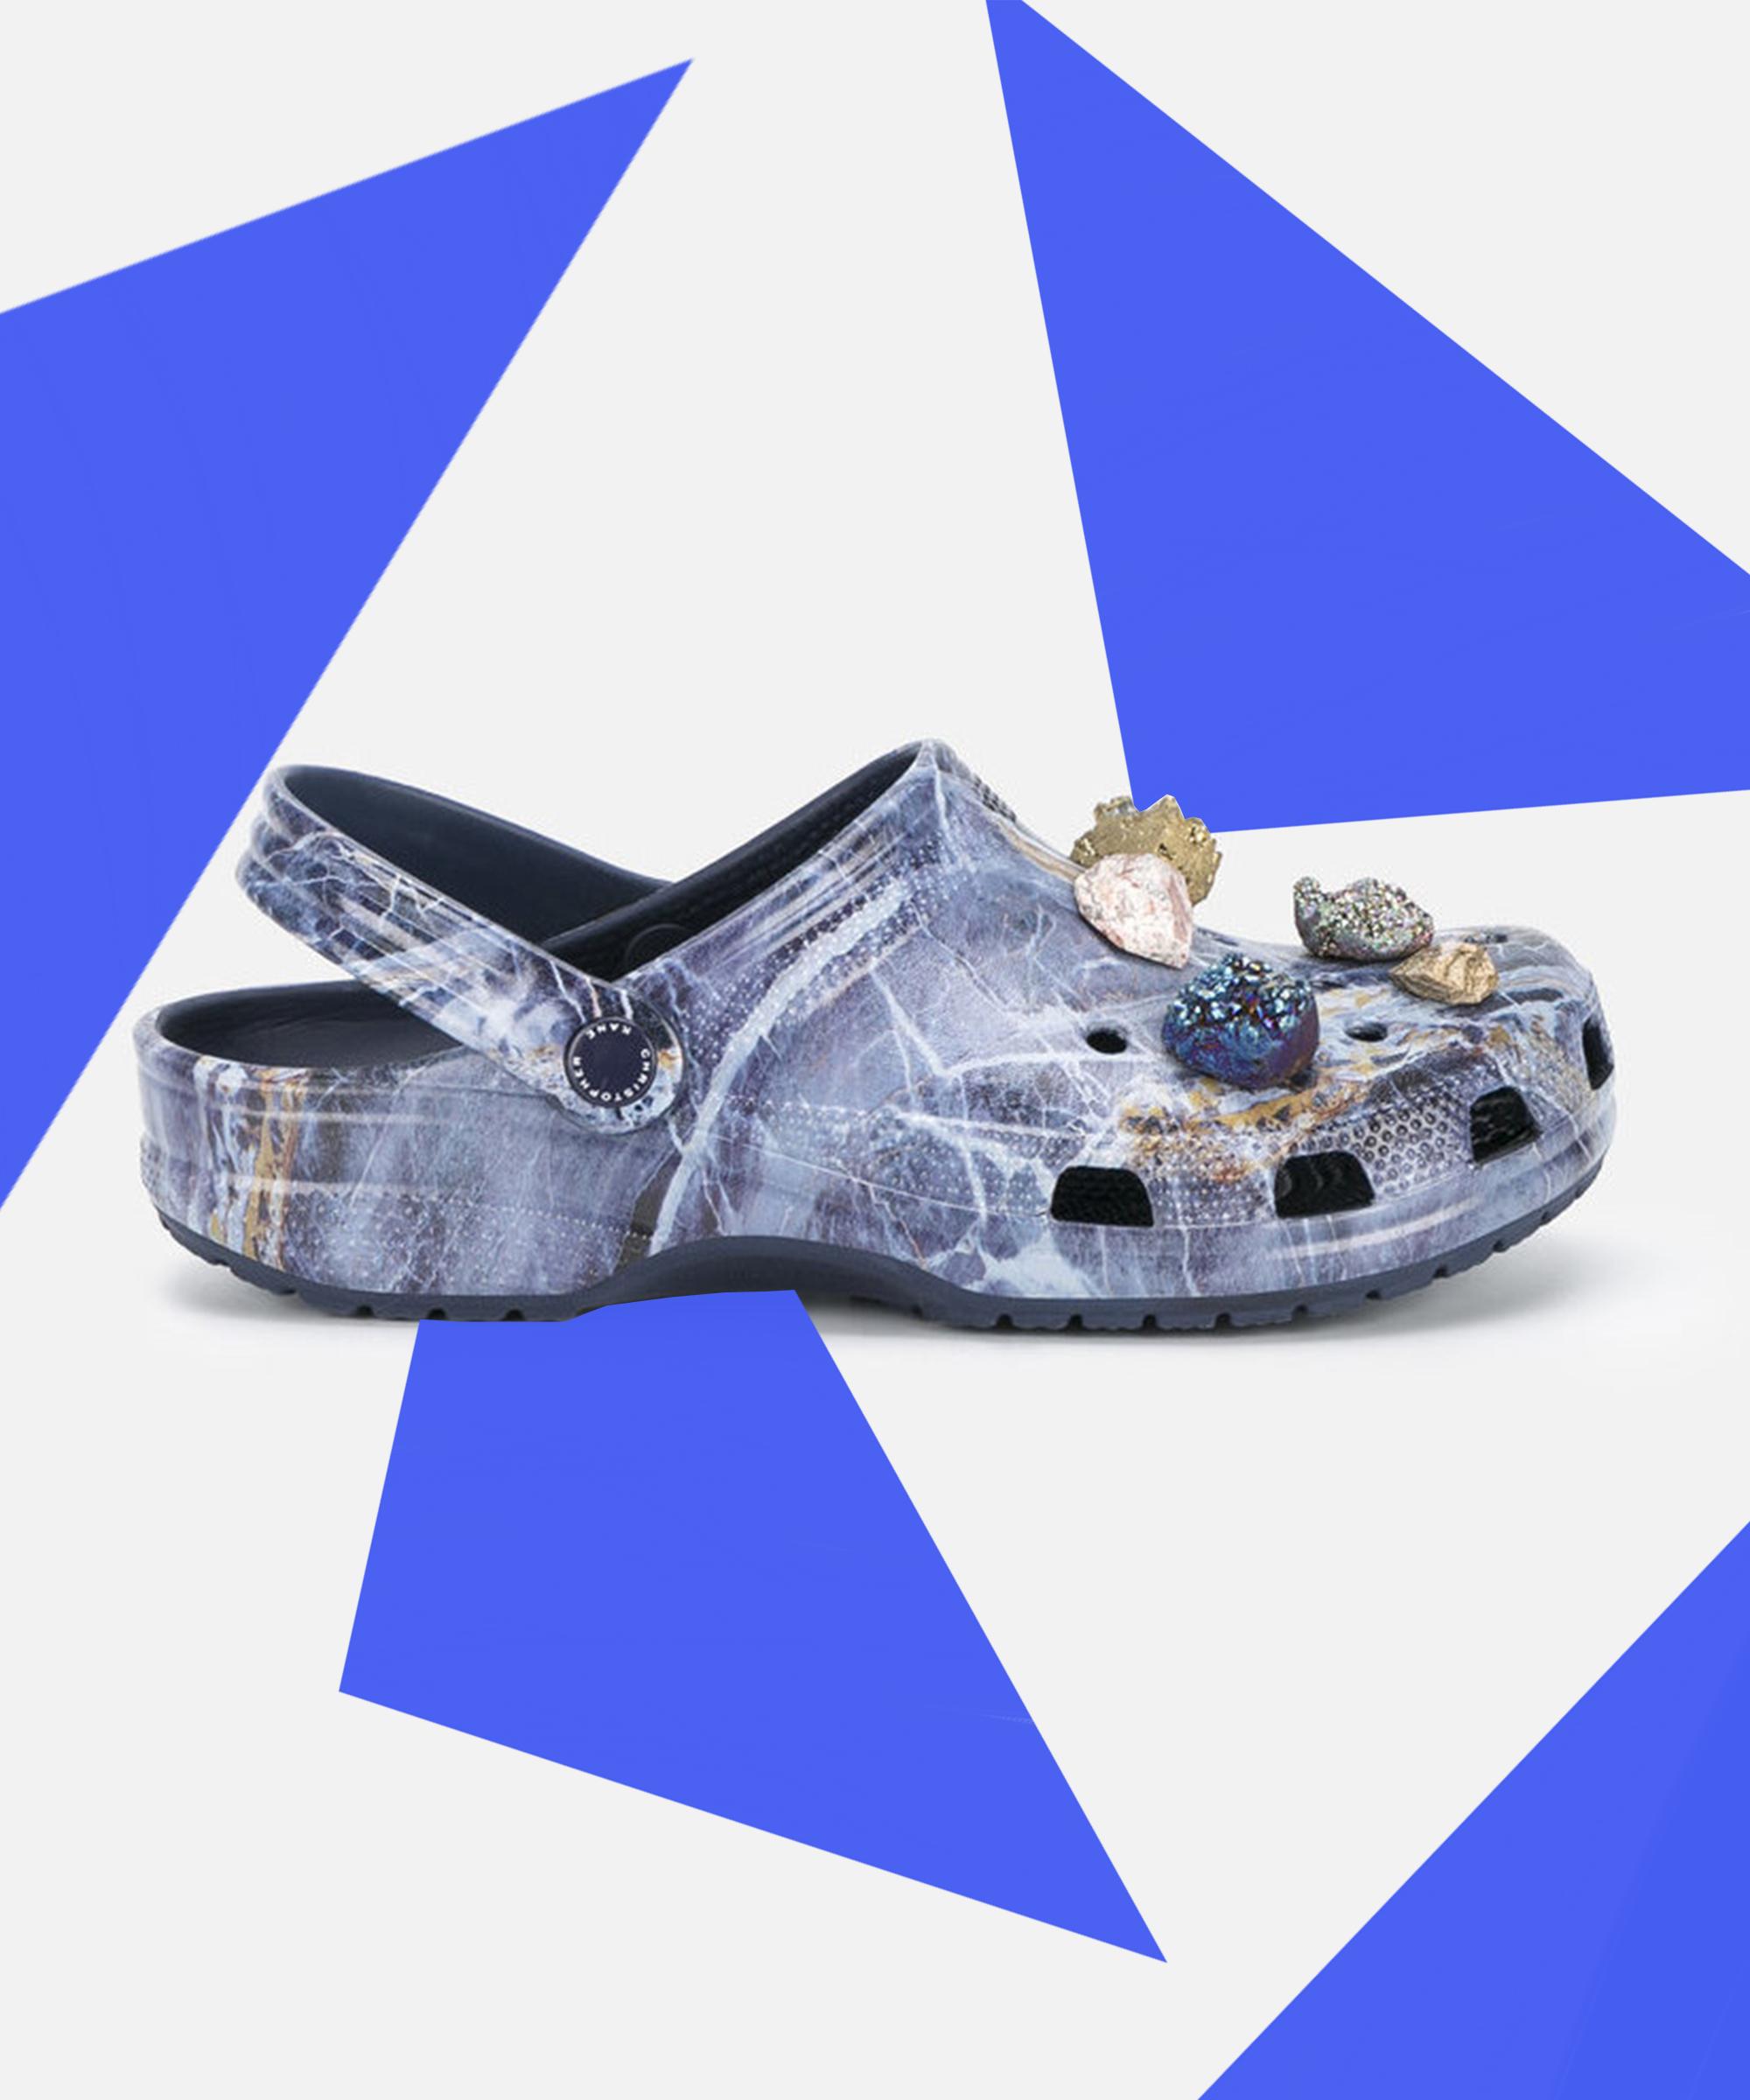 0f0f62e91b Ugly Shoe Trend - Best Summer Sandal Styles